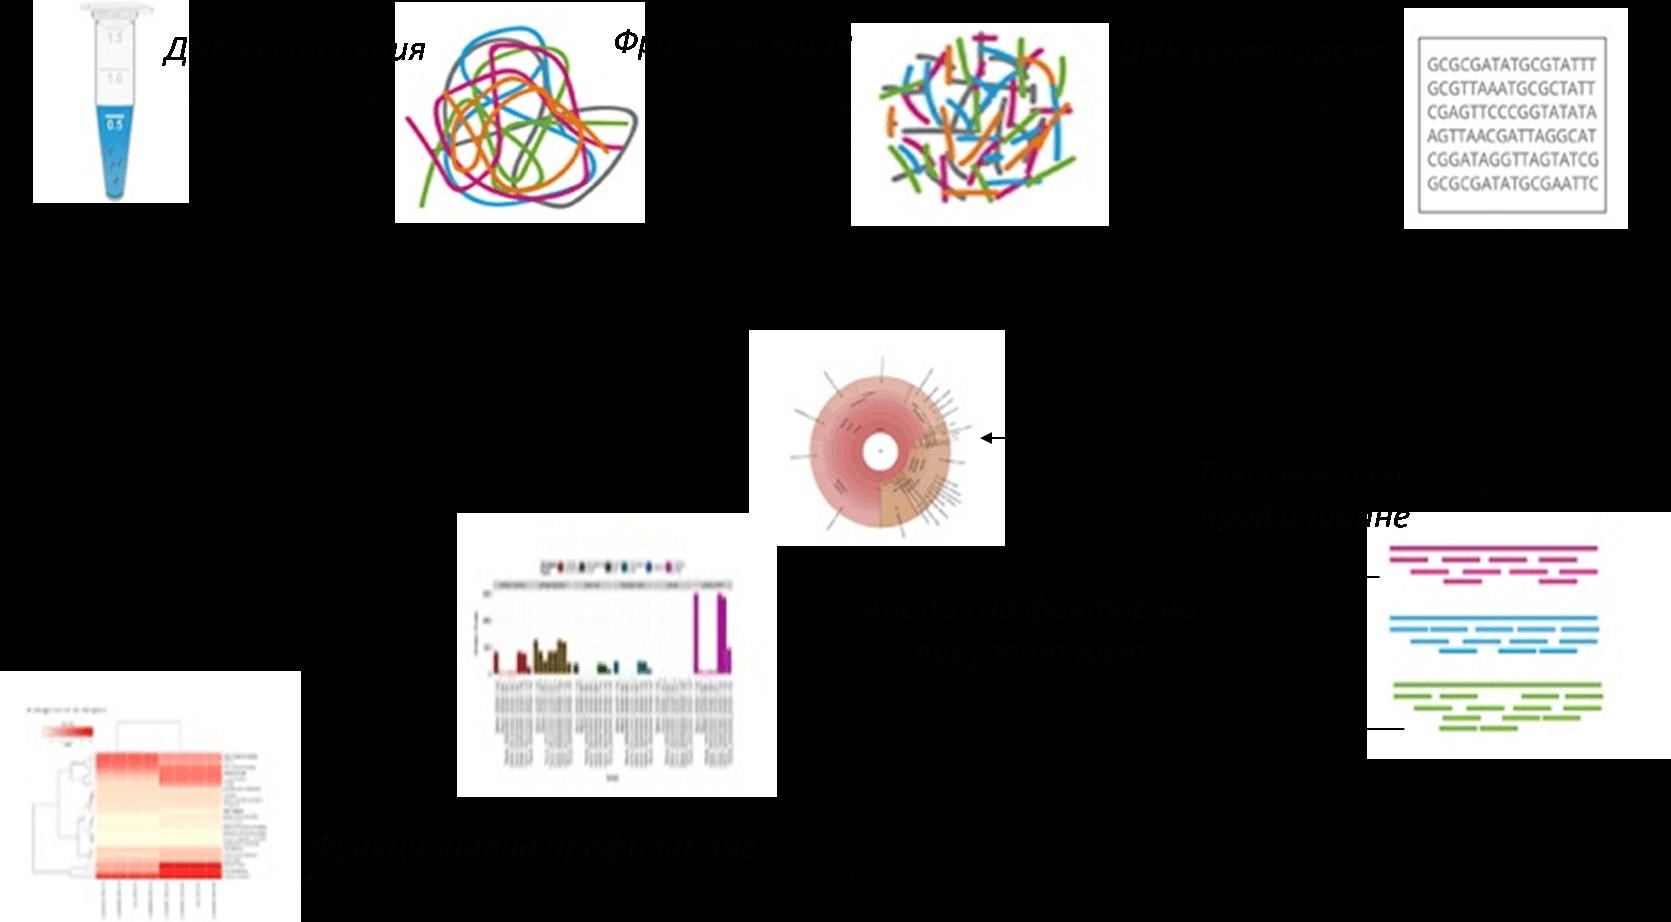 (Фиг. 5). Метагеномен анализ